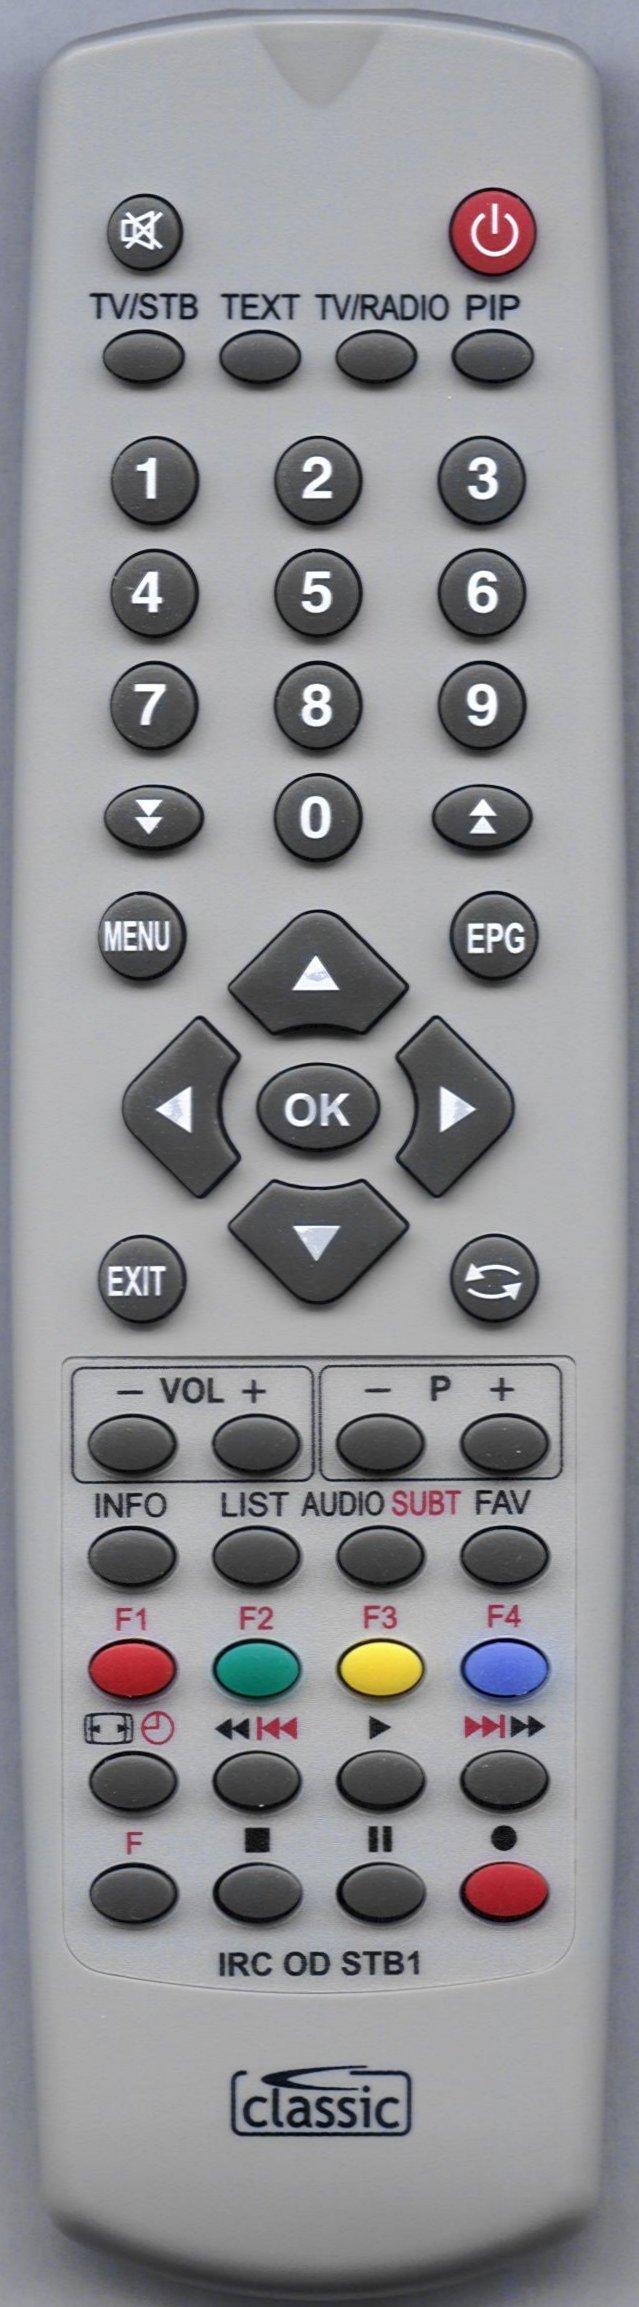 TECHNOMATE TM-5200 Replacement Remote Control